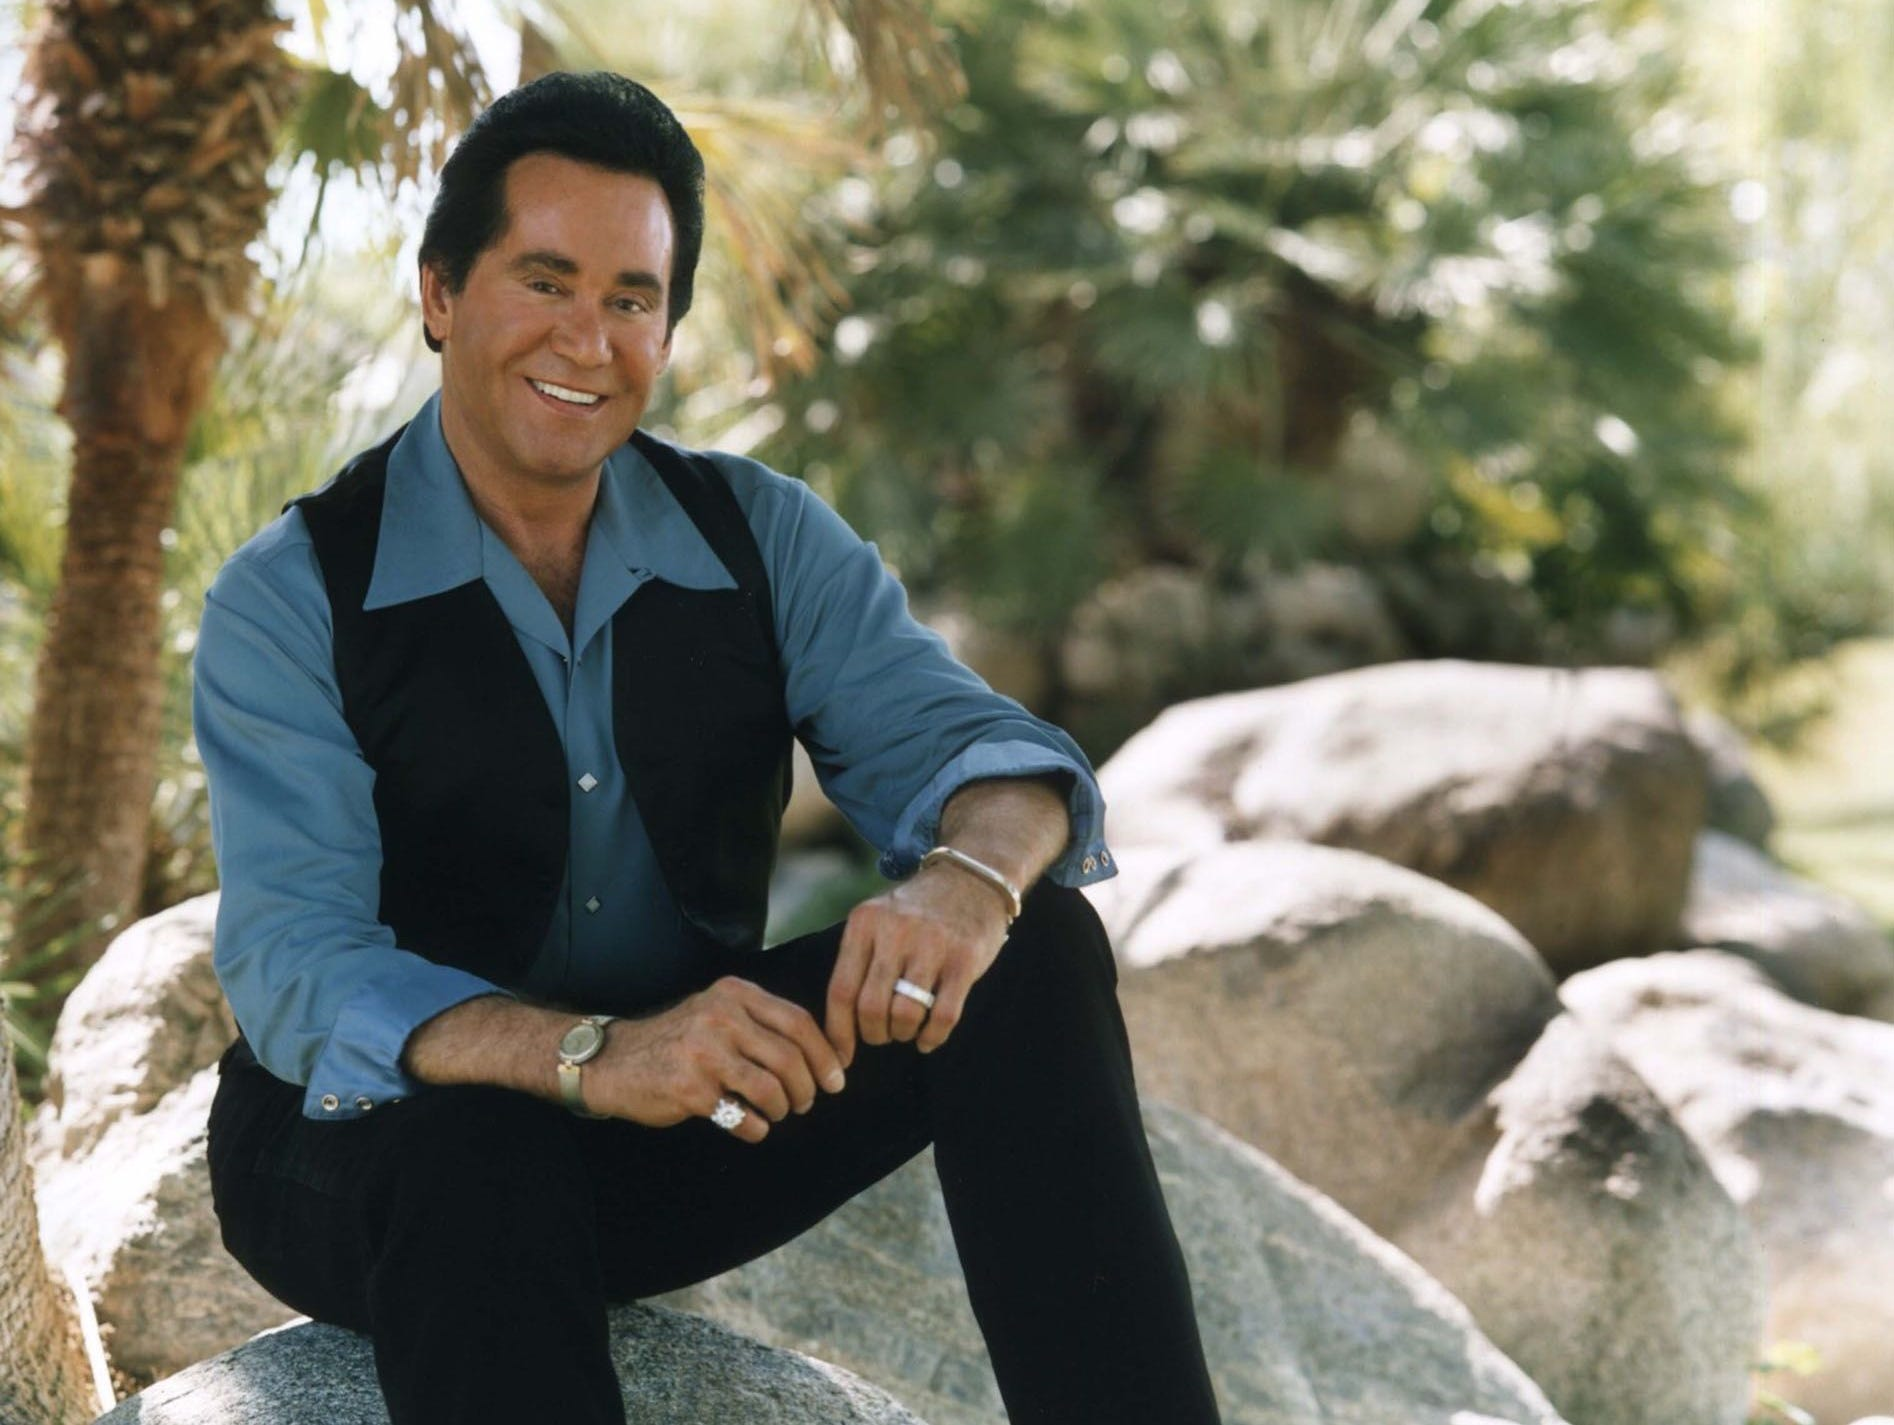 A promotional image of Wayne Newton.